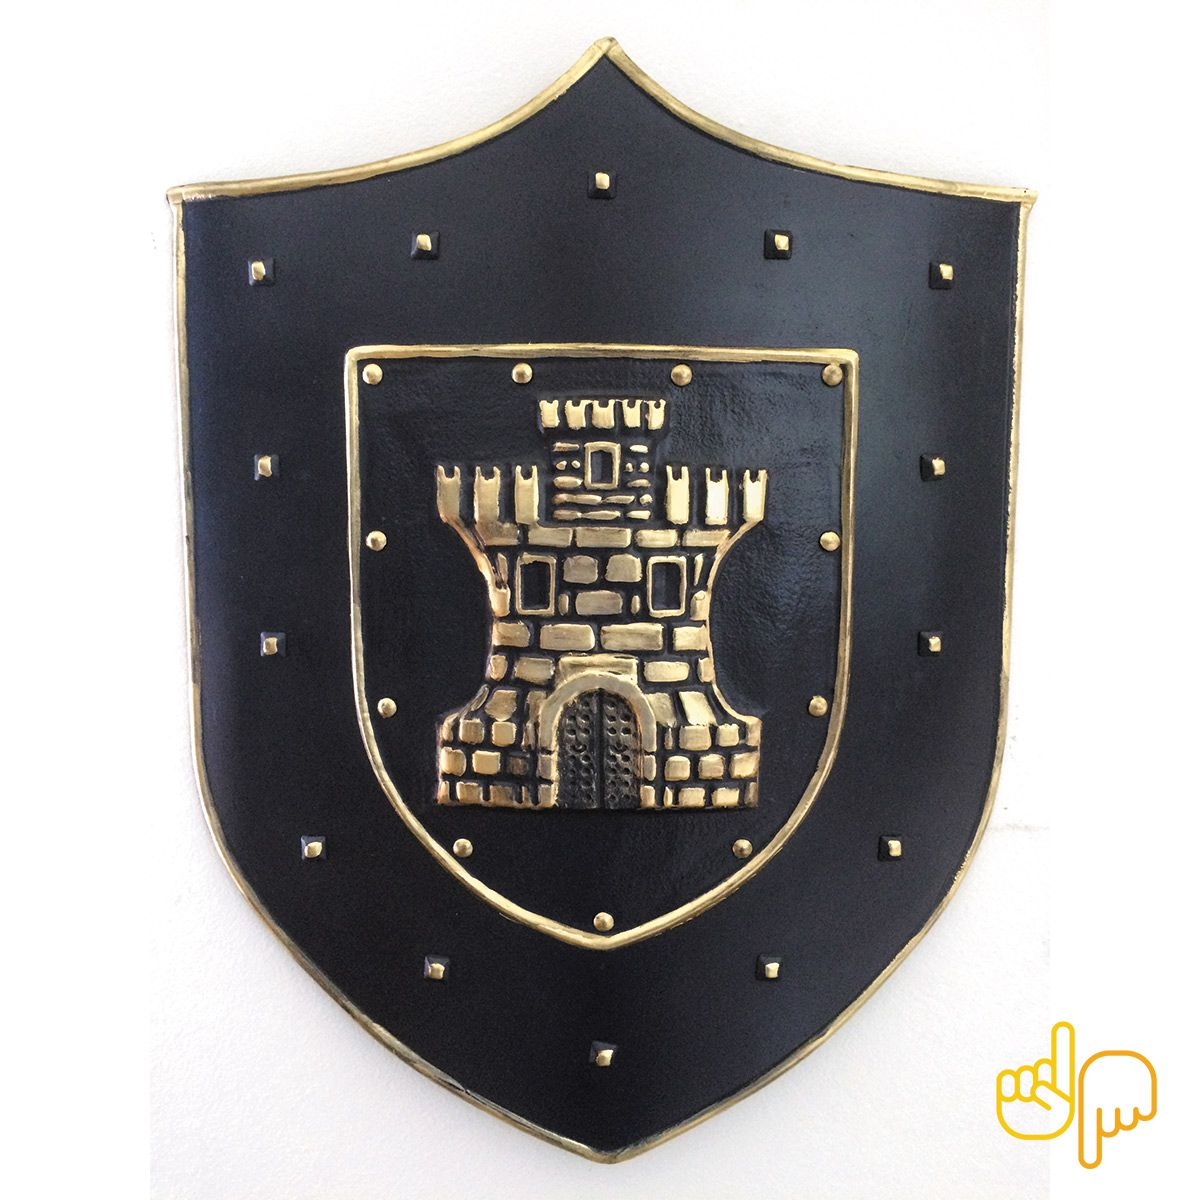 Escudo de Parede Medieval Mod. Castle Entrance